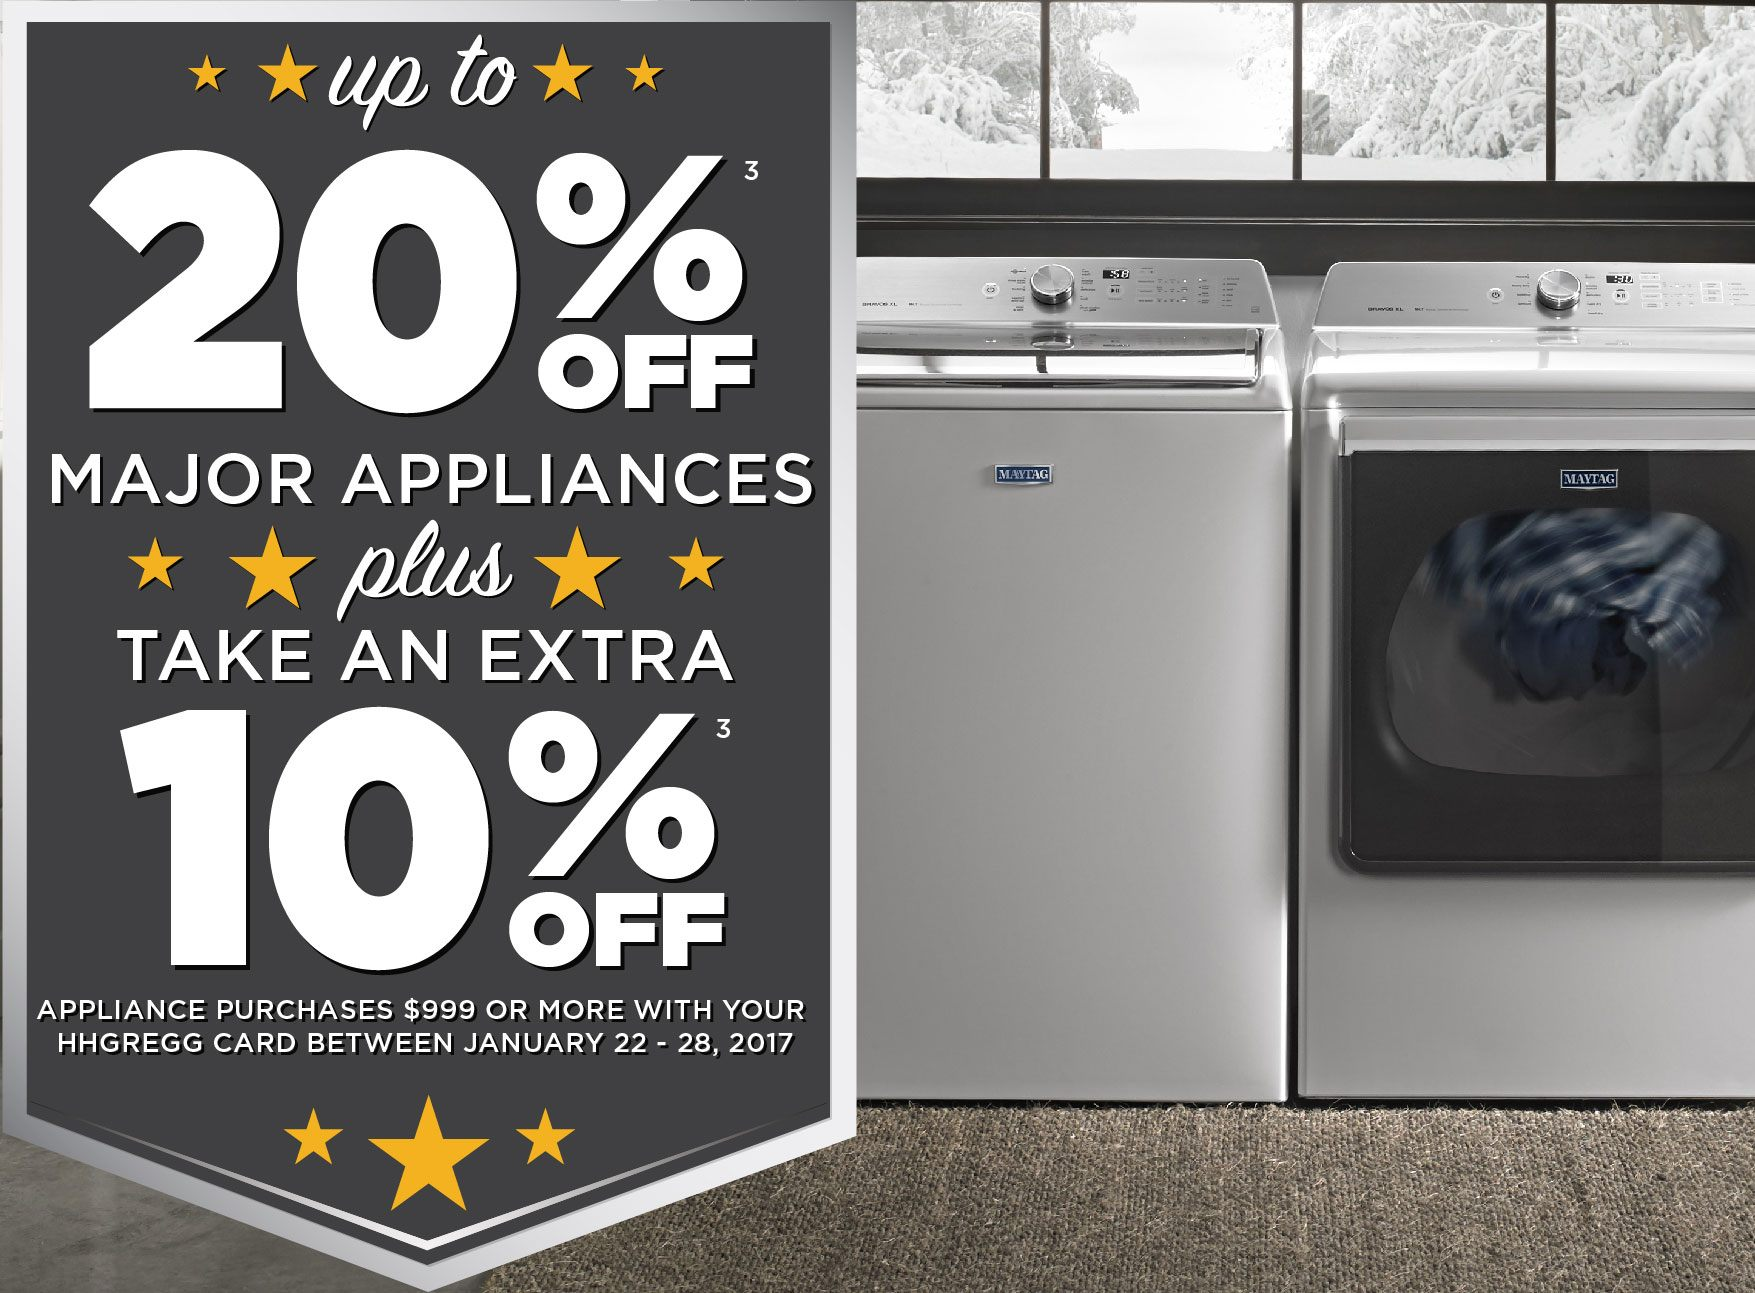 hhgregg Major Appliances - up to 20% off PLUS extra 10% on hhg card $999+